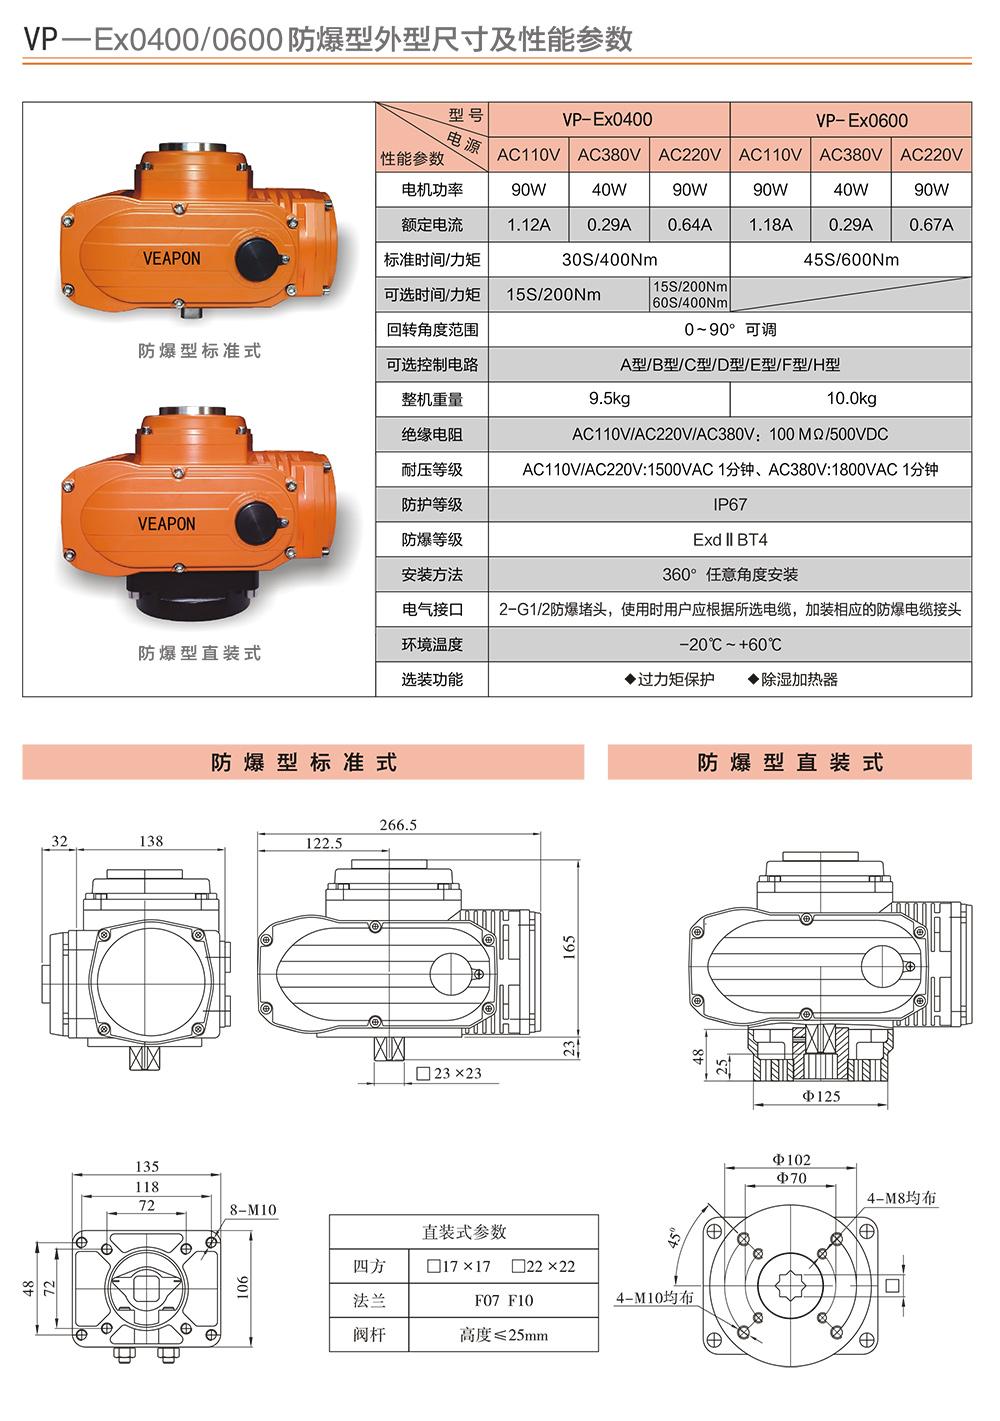 VEAPON防爆电动执行器尺寸图